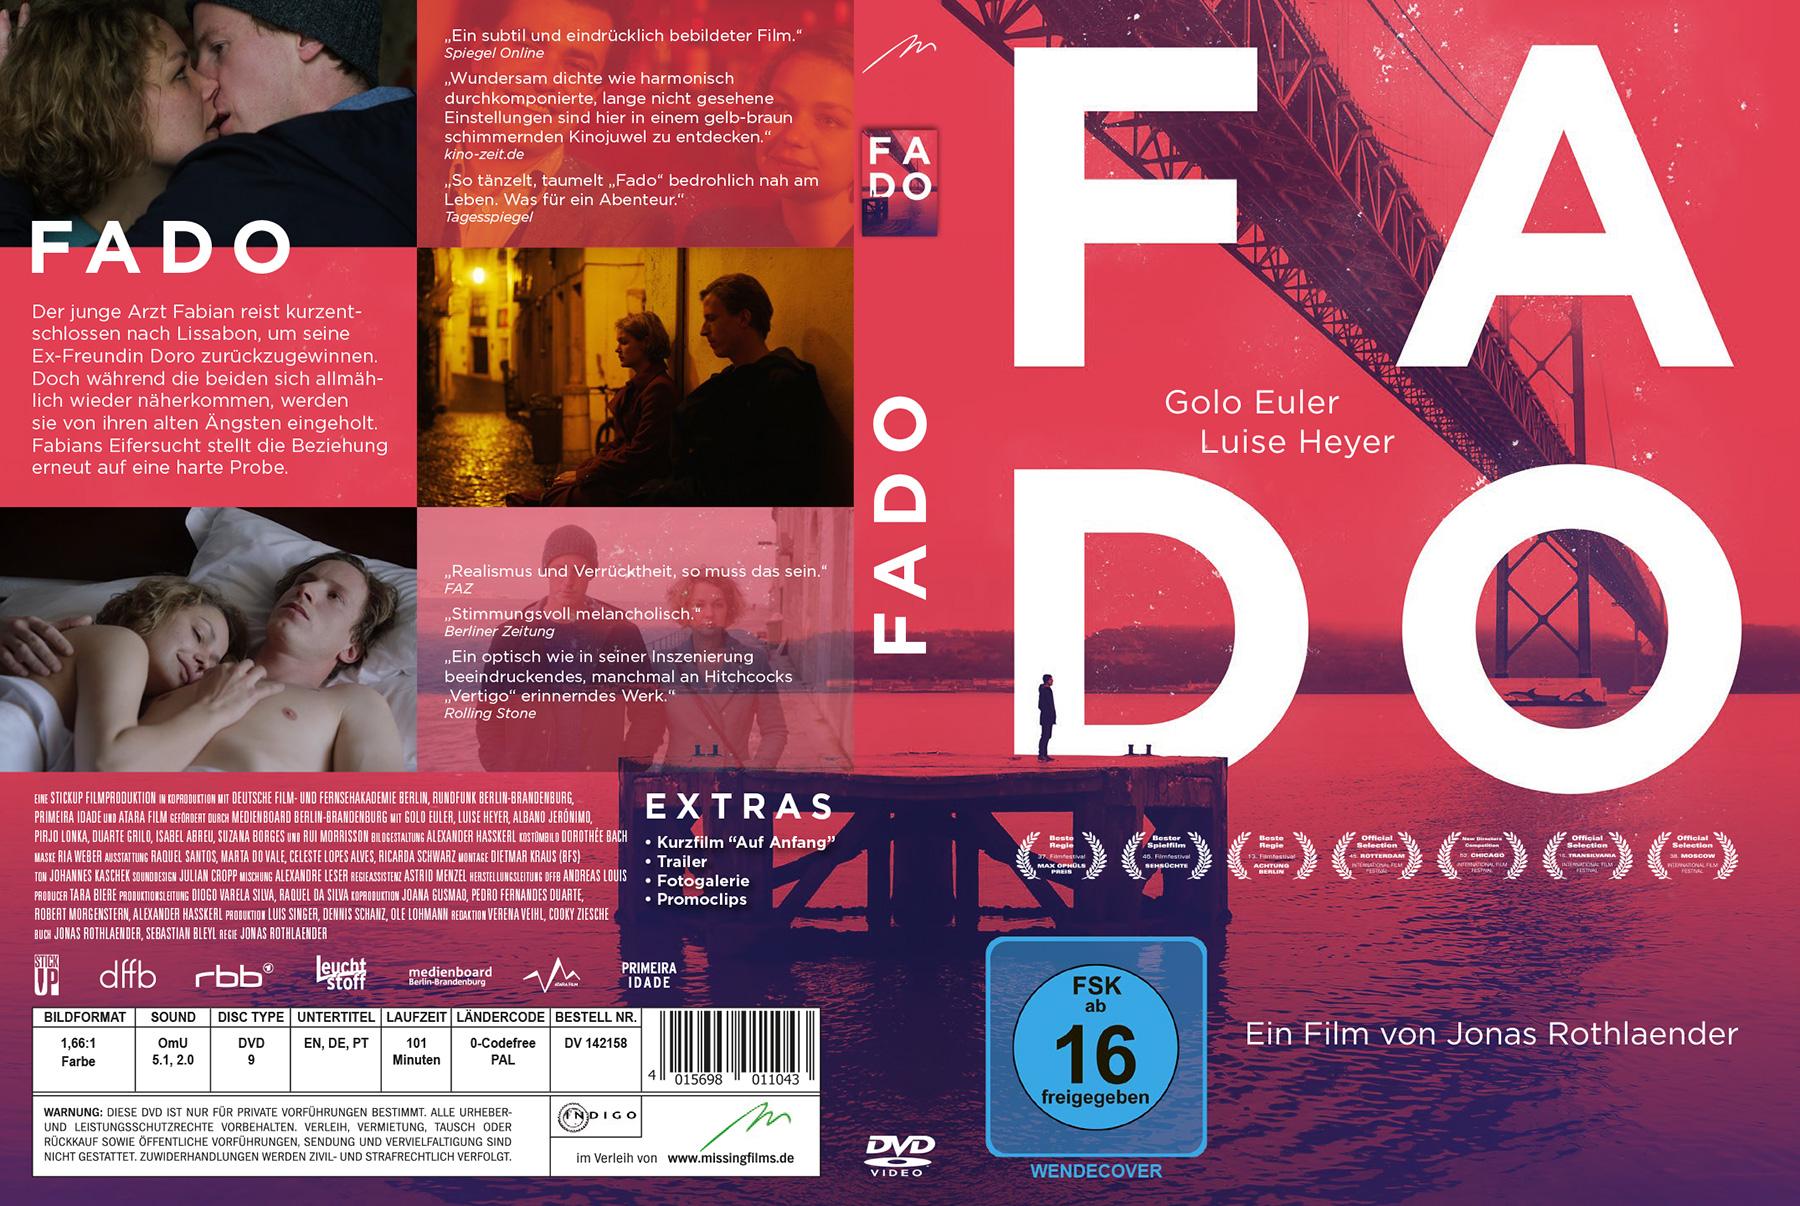 FADO - DVD cover | Korporal Web&Graphic Design